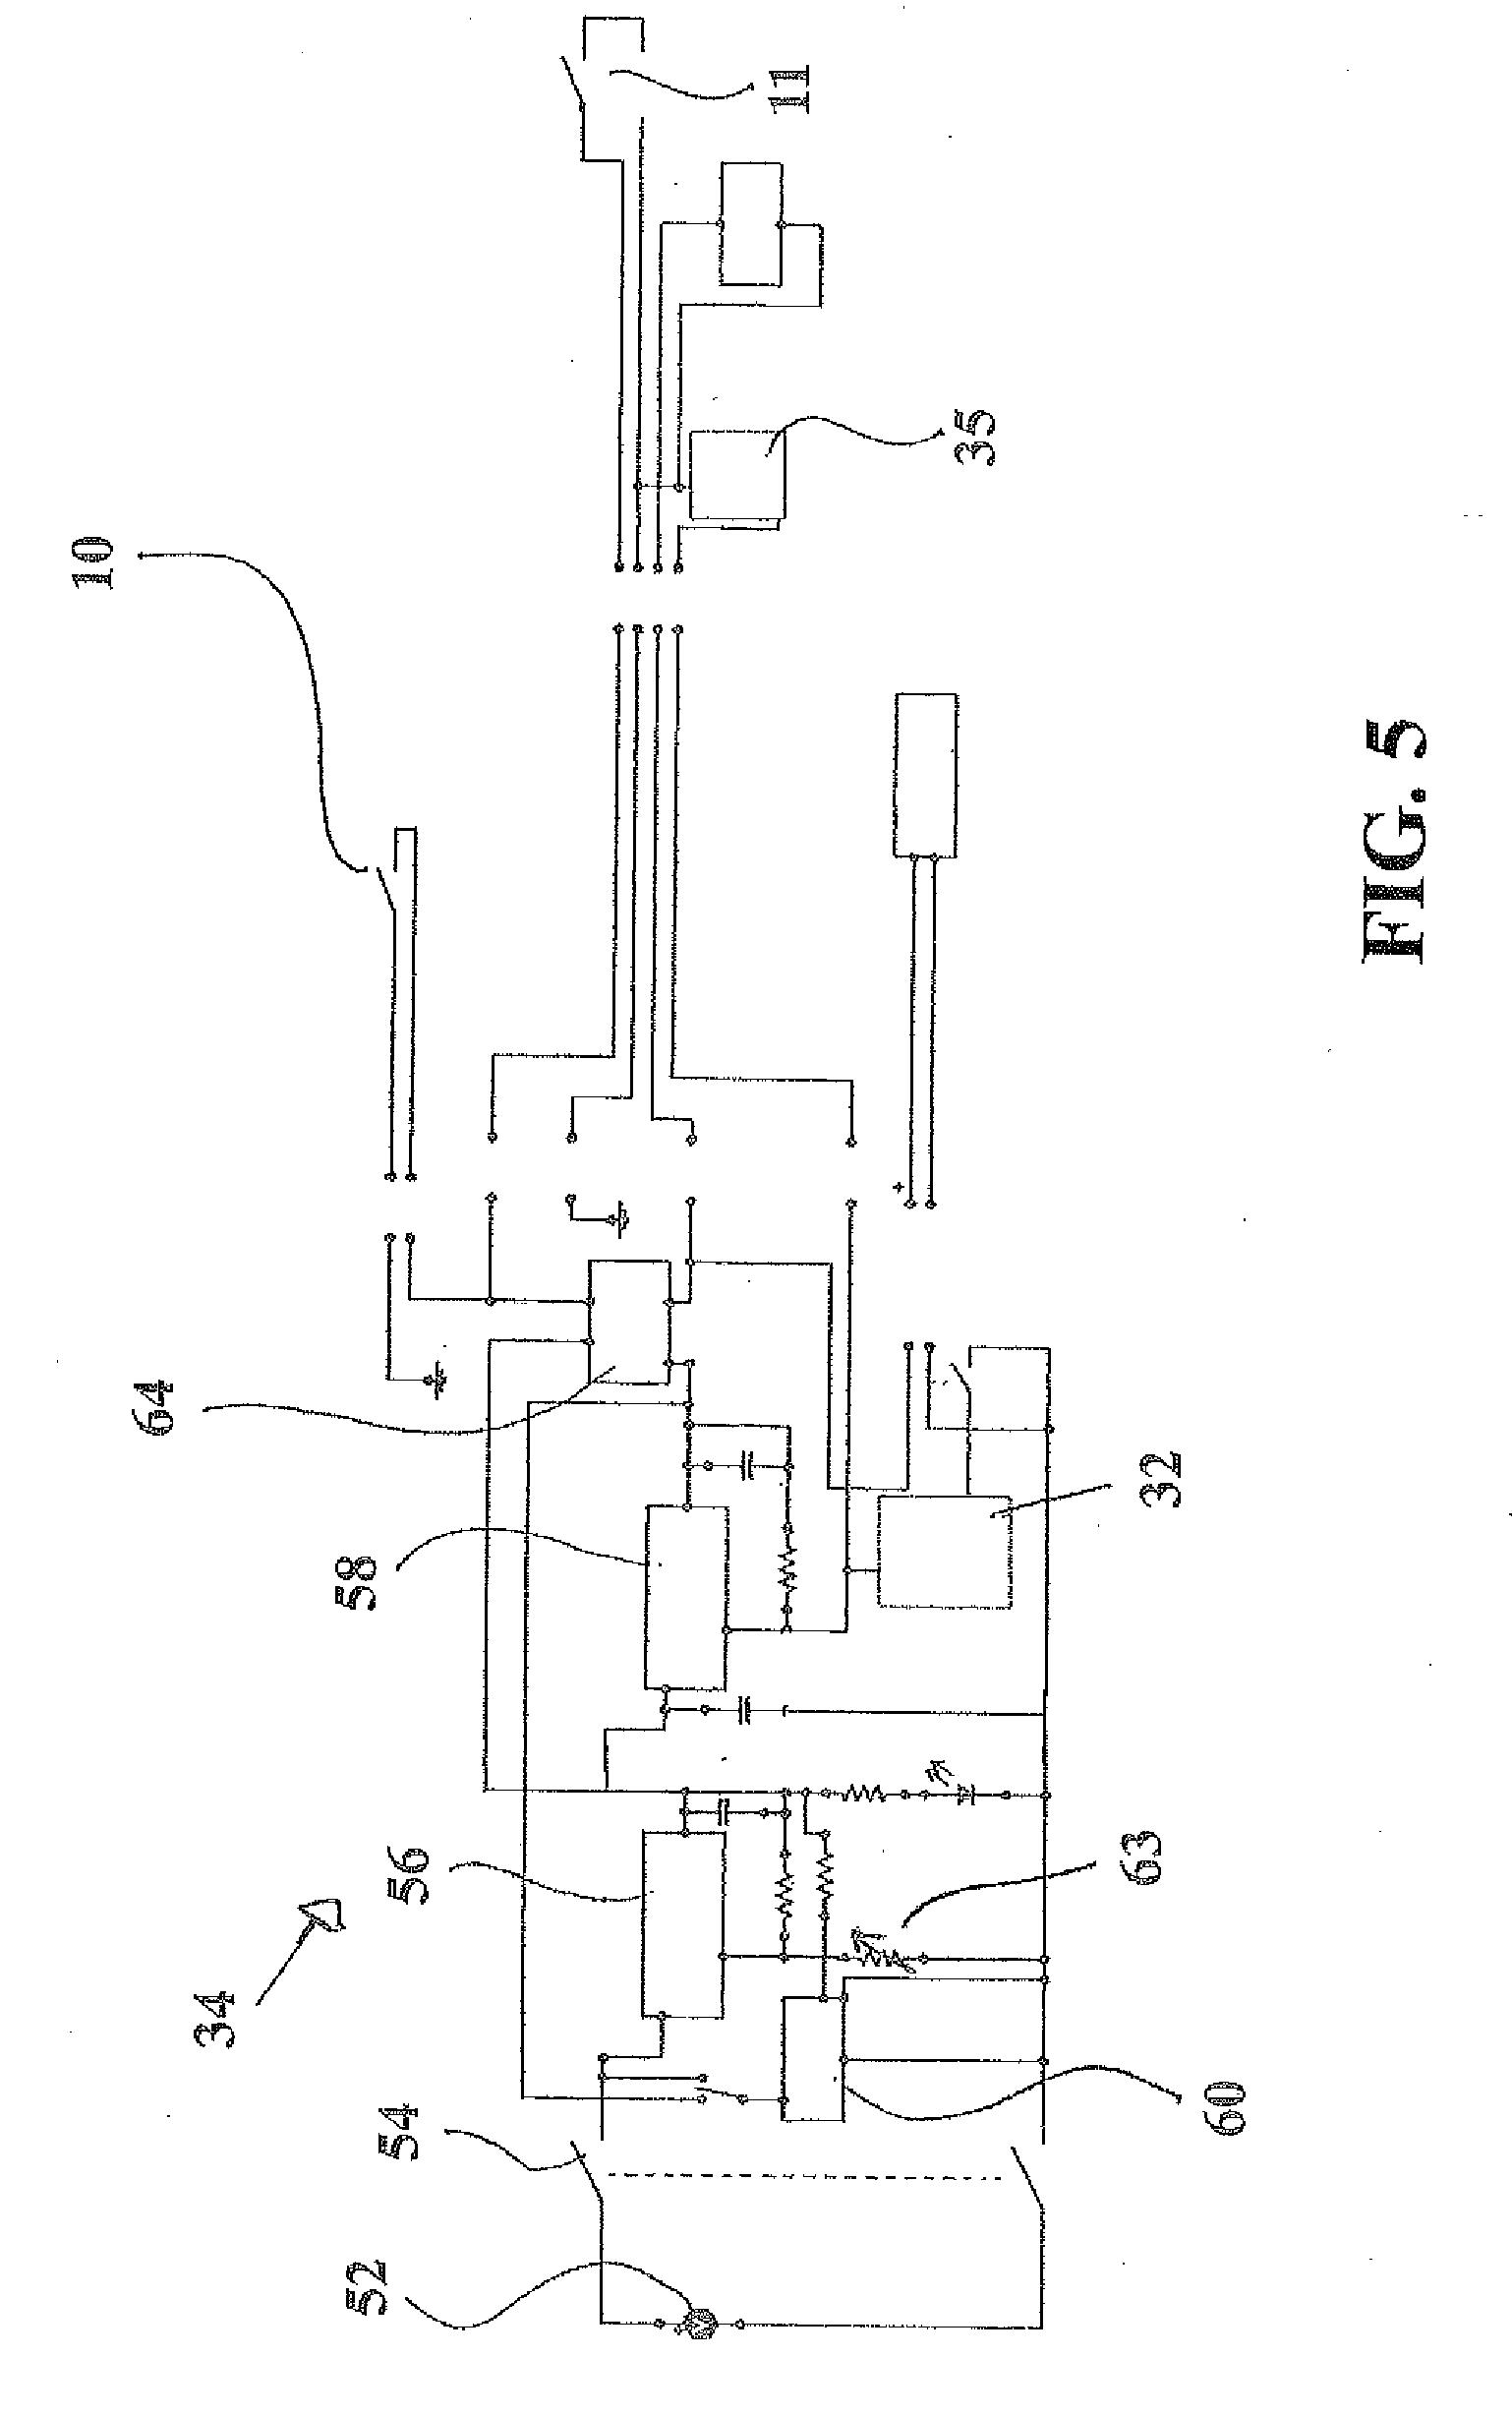 power supply wiring diagram pocket indicate tattoo power supply wiring diagram skin arts pocket indicate tattoo power supply wiring diagram